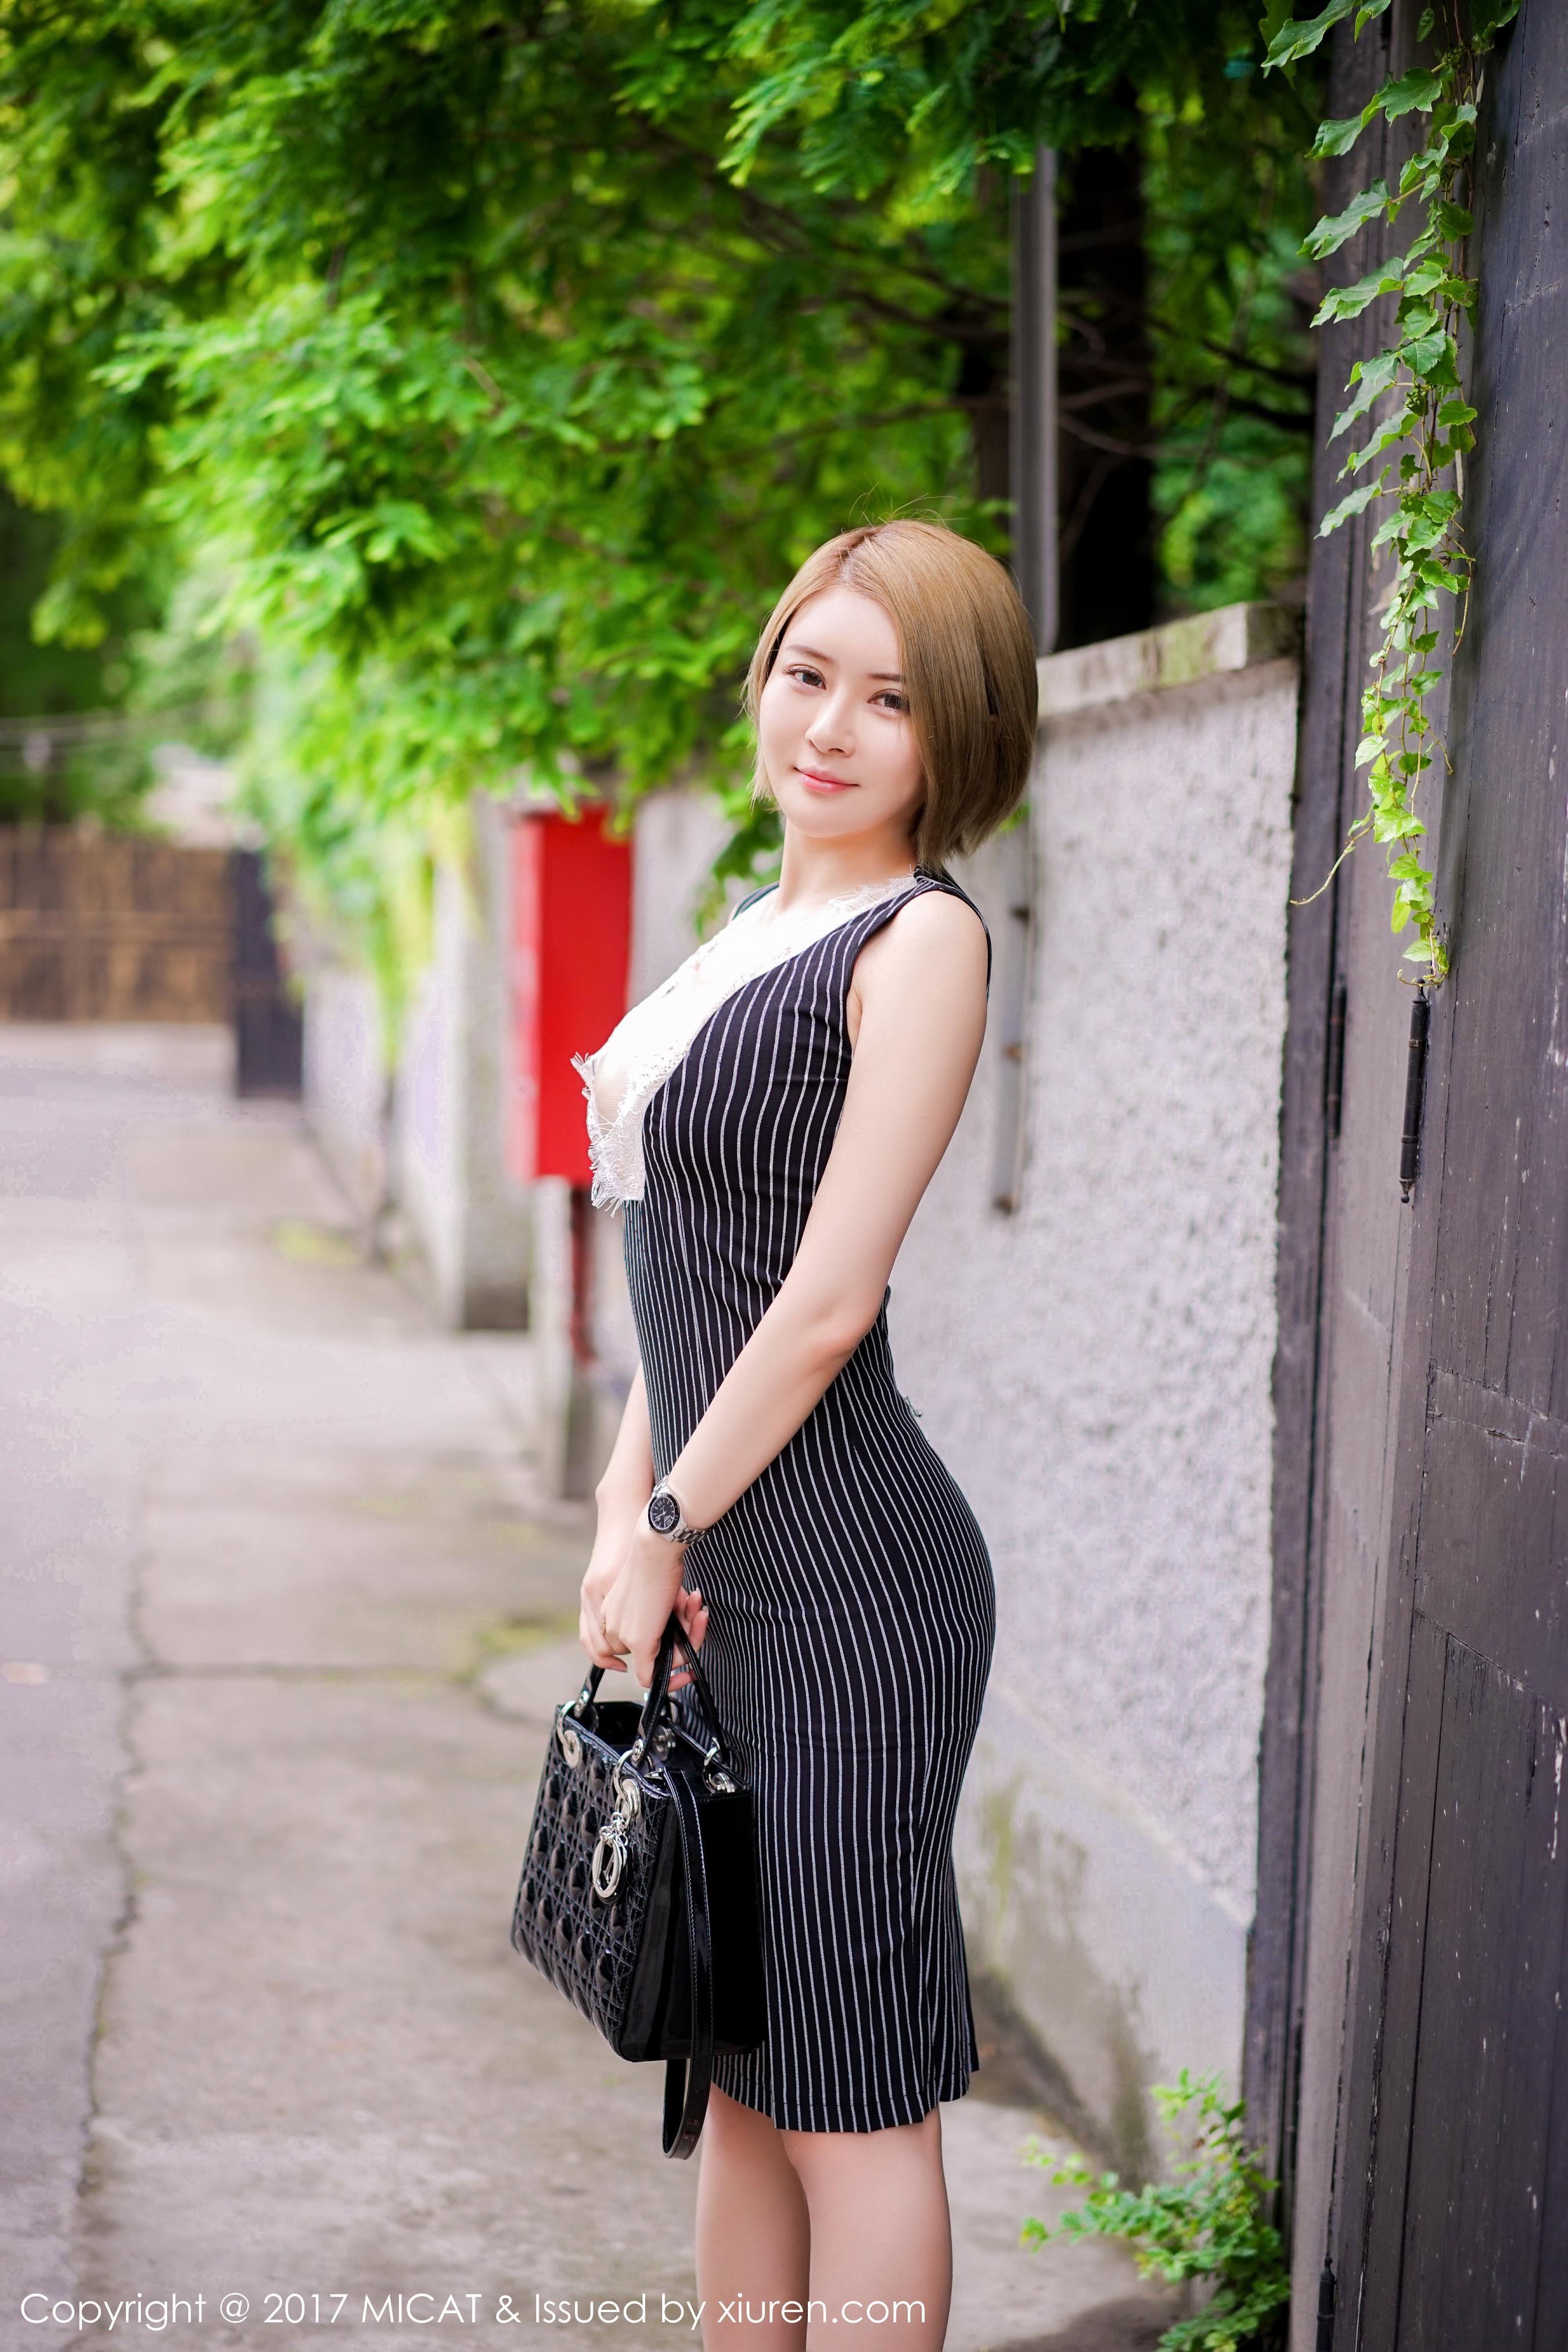 [MICAT猫萌榜]MCT20170620VOL0013 凯竹BuiBui 深V连身裙与黑色镂空内衣性感私房写真集